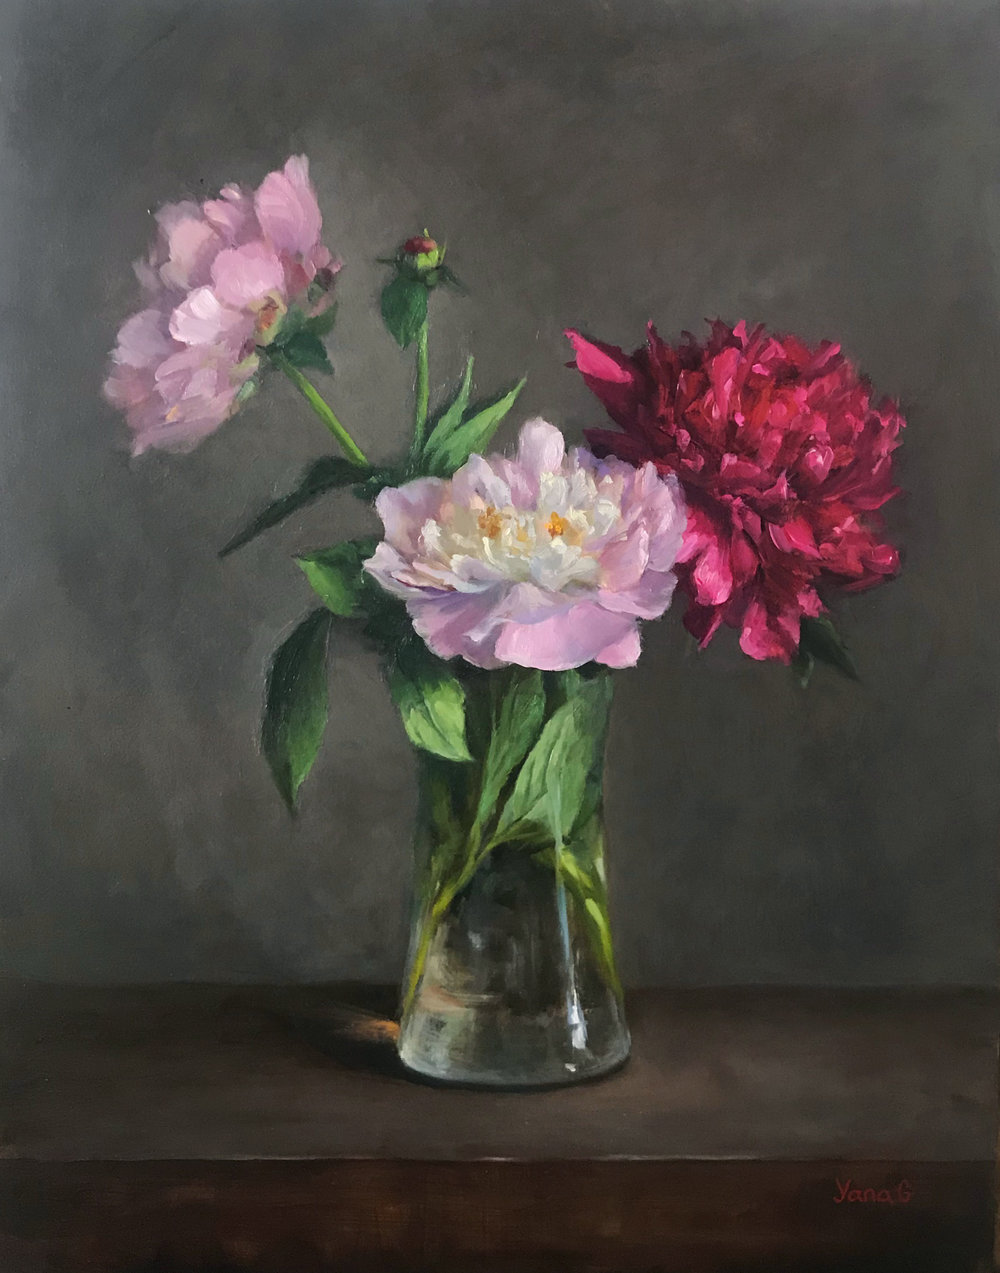 Peonies in the vase 11x14 Oil on board